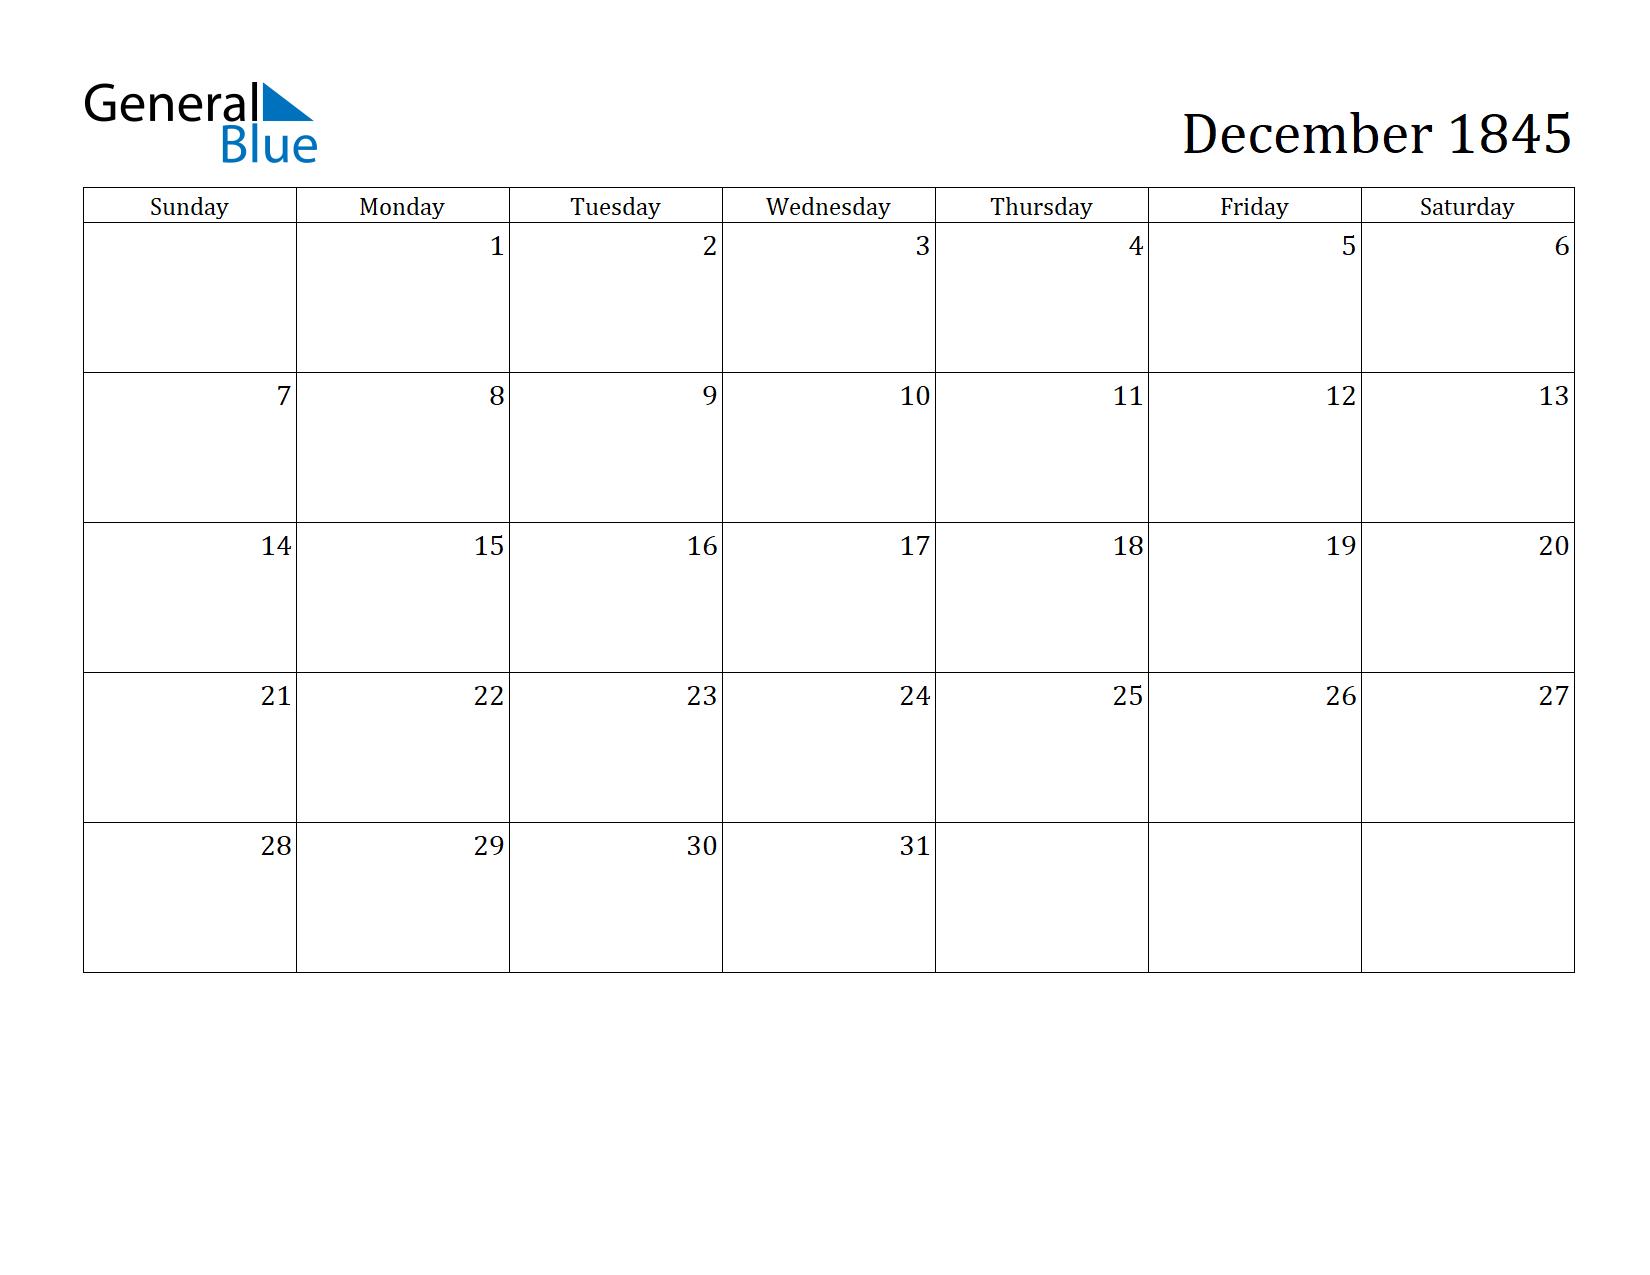 Image of December 1845 Calendar